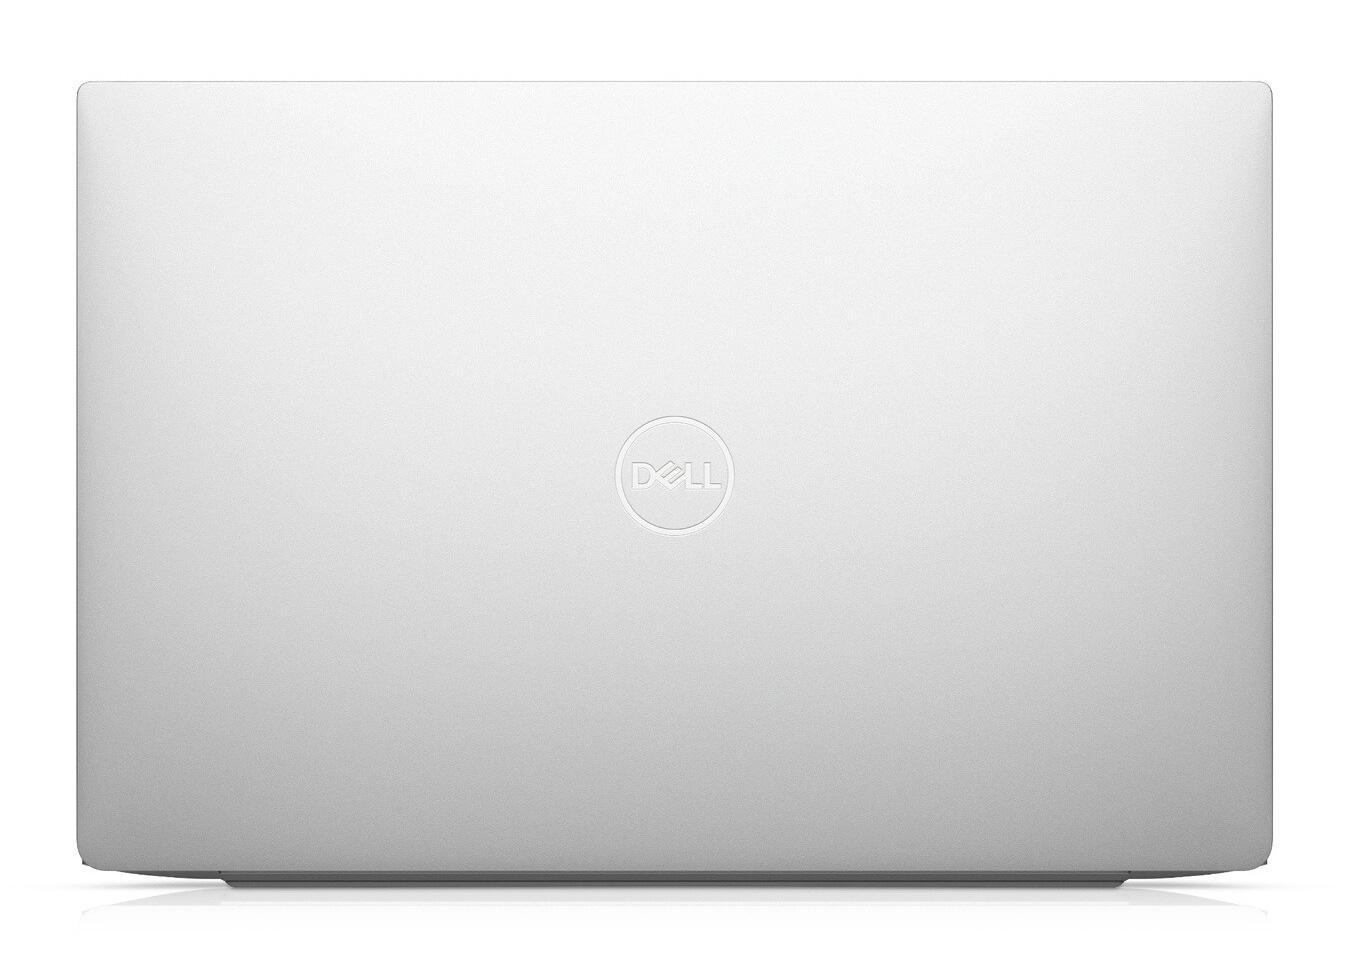 Ordinateur portable Dell XPS 13 7390 Blanc - Core i5, 8 Go, 512 Go - photo 5